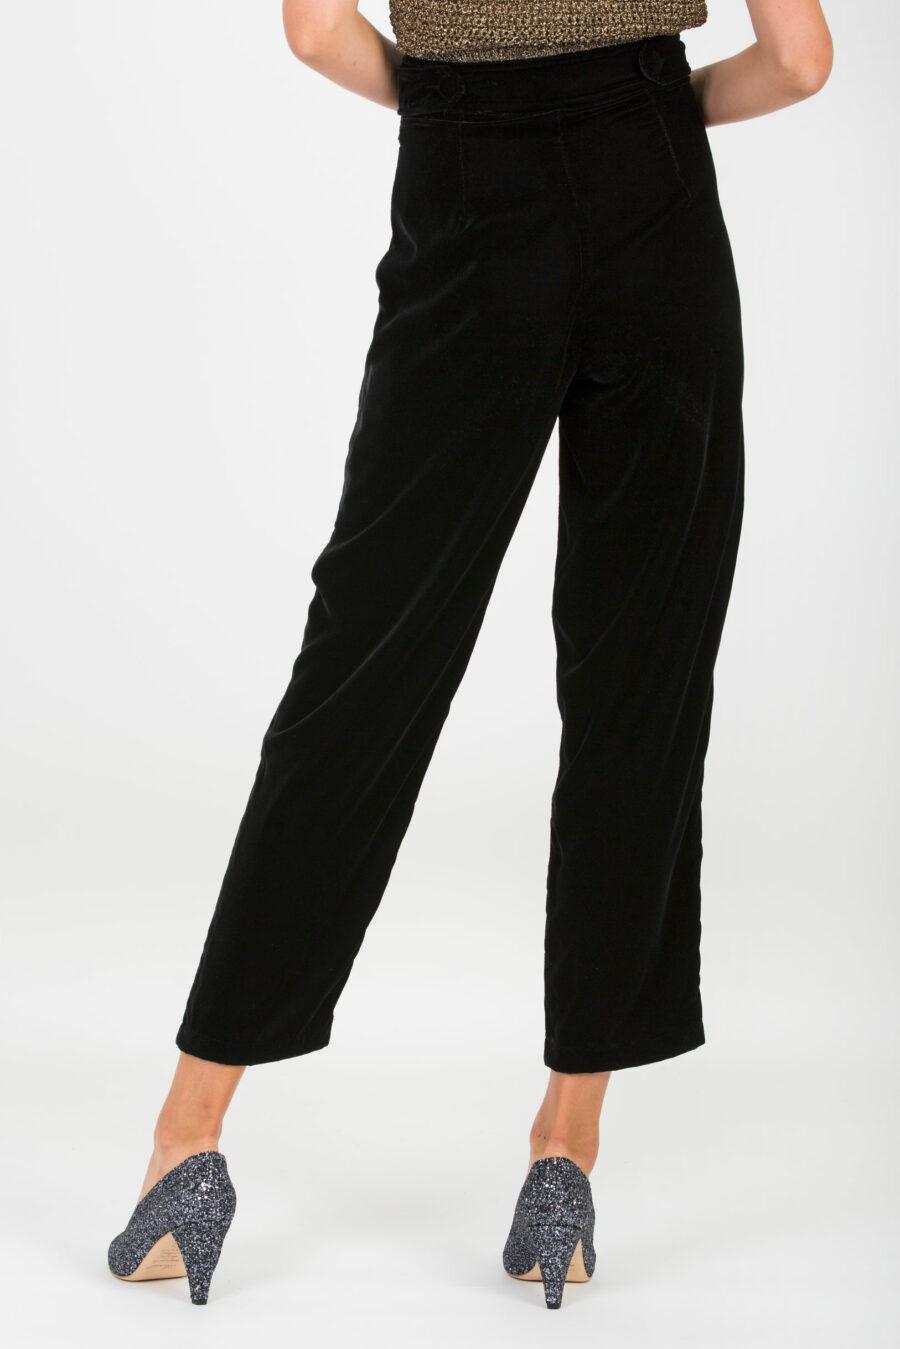 Lupita Black Velvet Pants